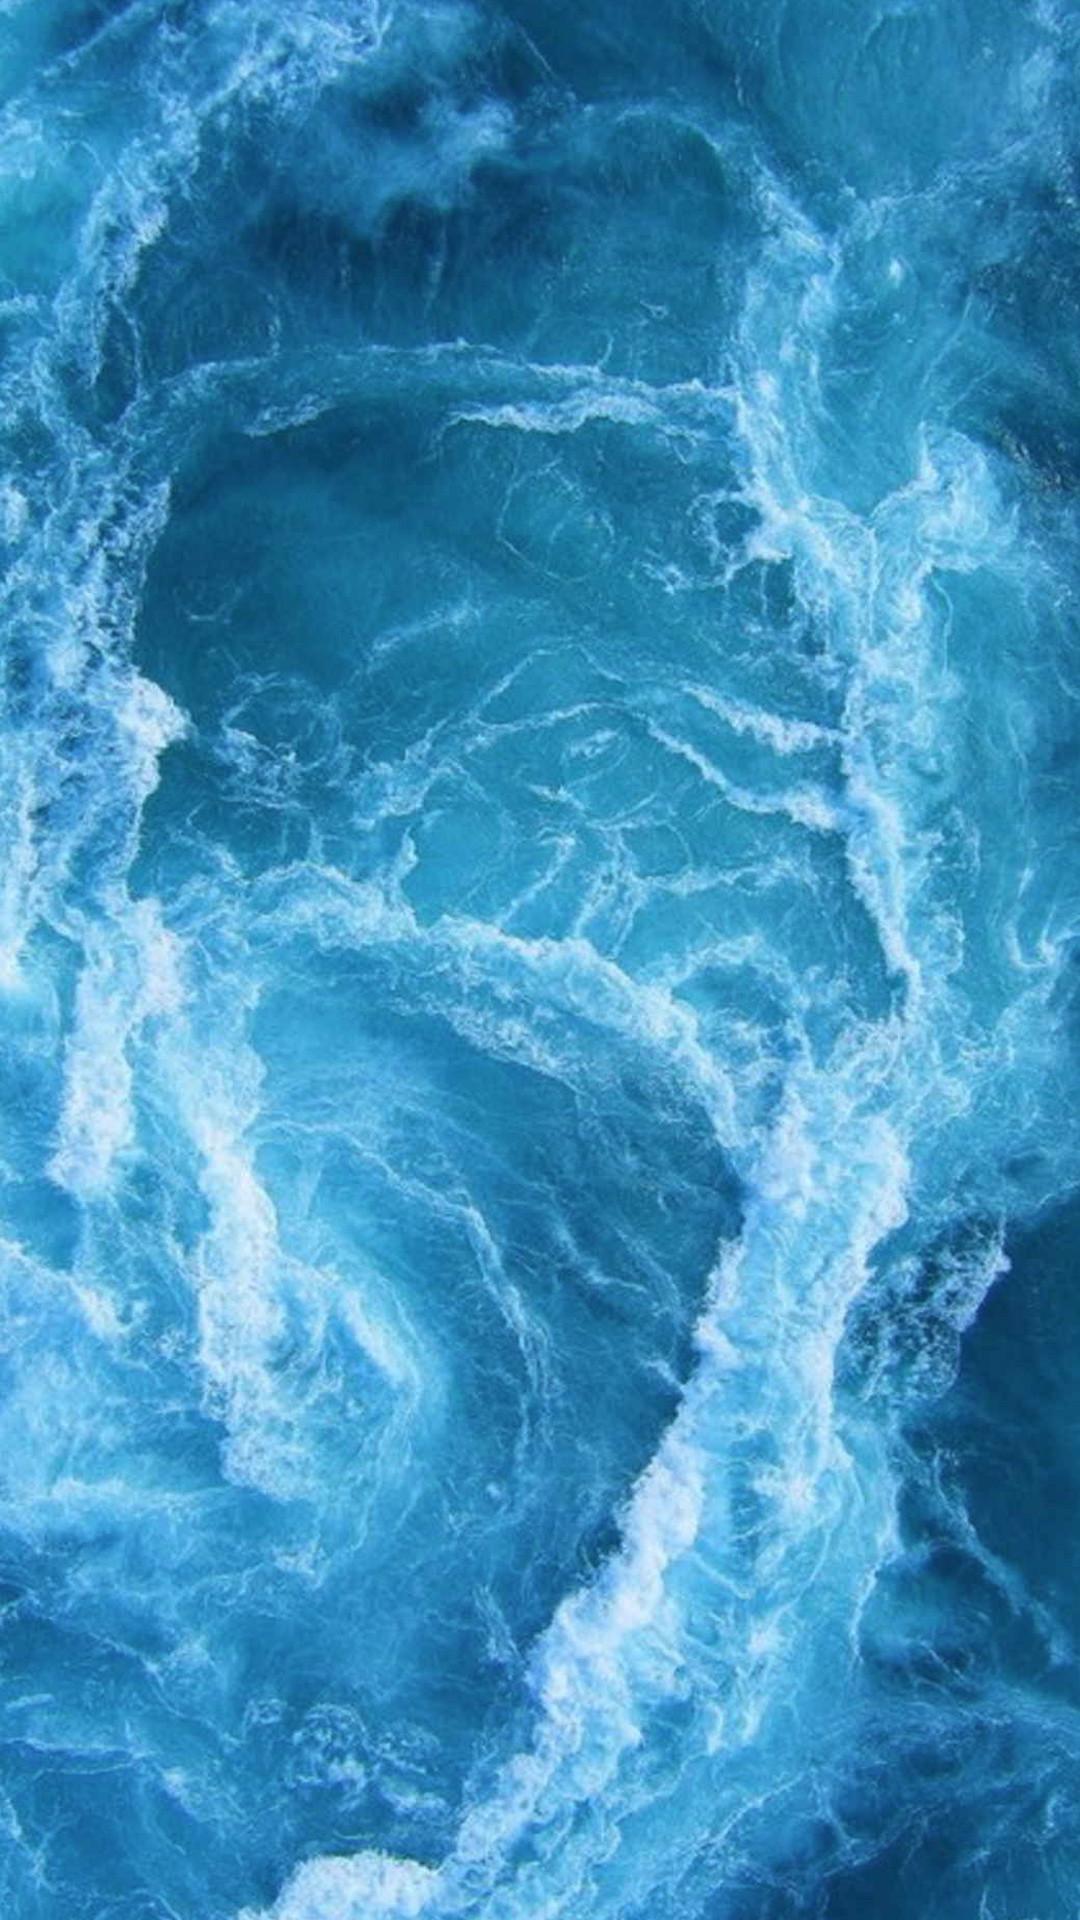 ocean waves wallpaper hd (60+ images)